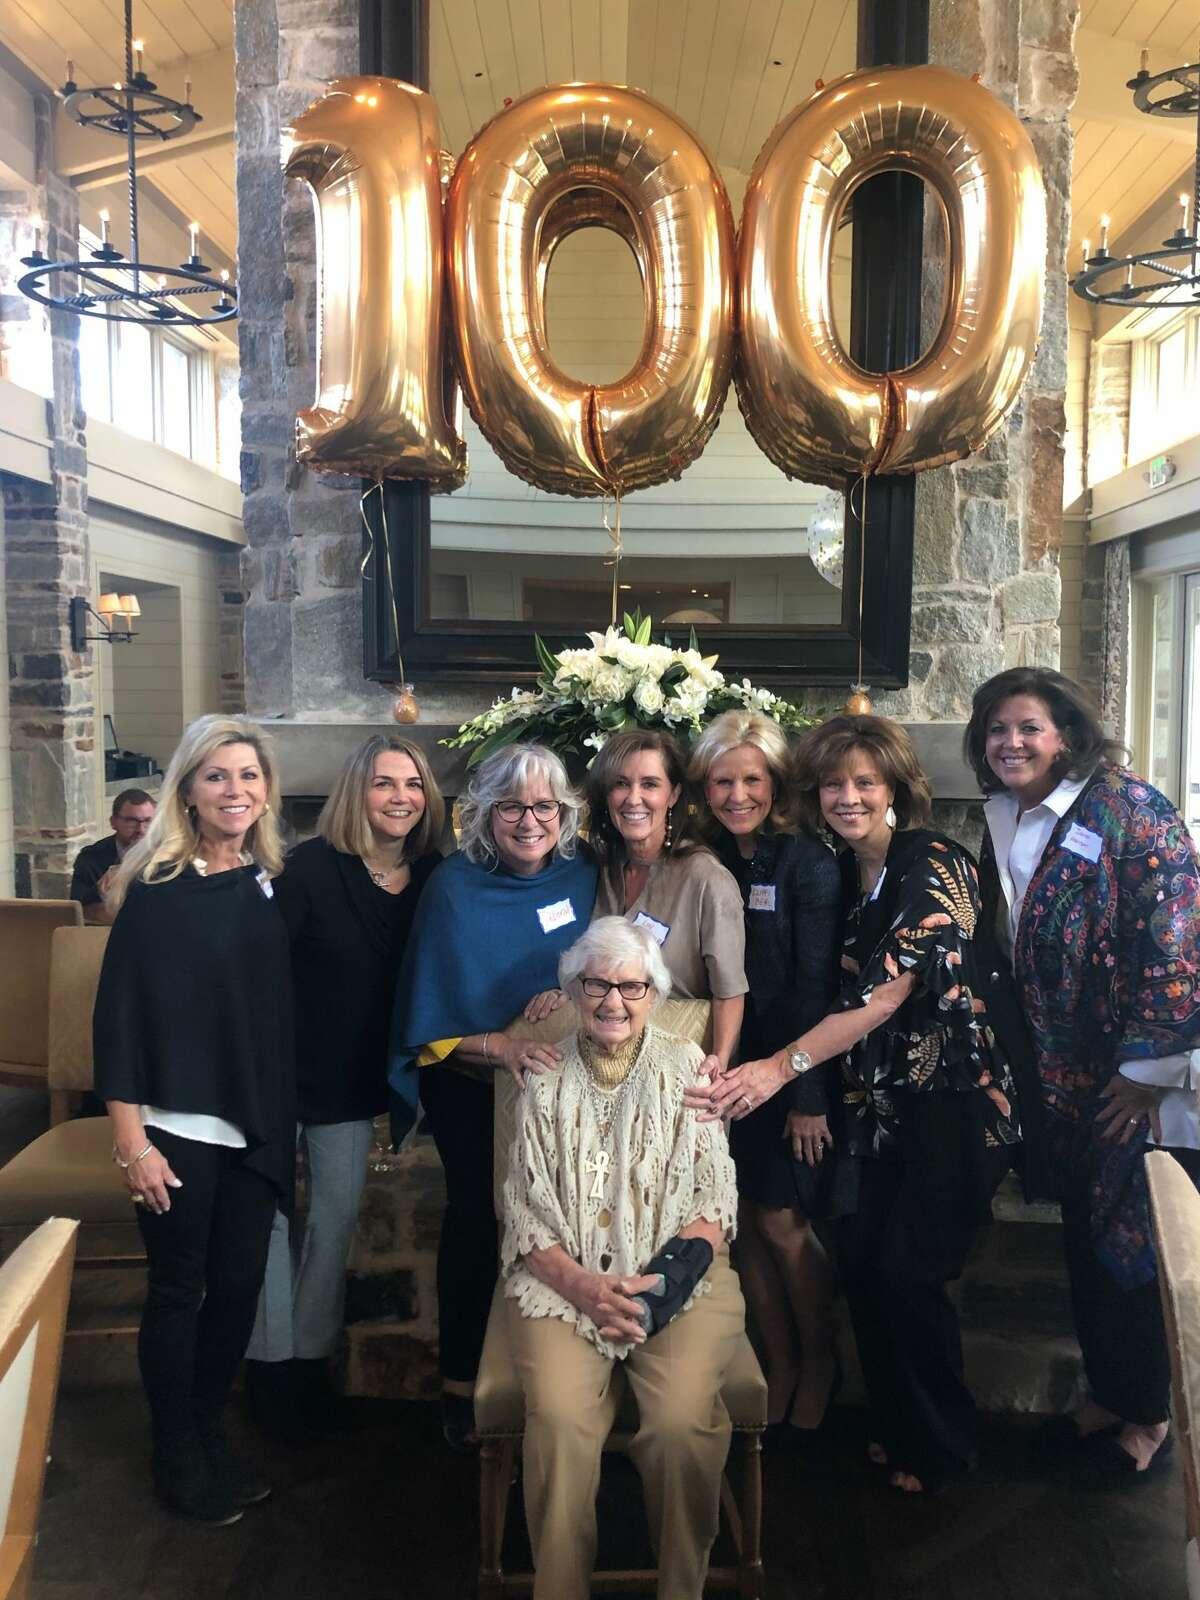 Stork party: Molly Williams, from left, Jeanne Pollard, Deborah Dean, Lyn Ochsner, Cliffy Beal, Annette Culp and Janet Hanson; and Pauline Stork, front